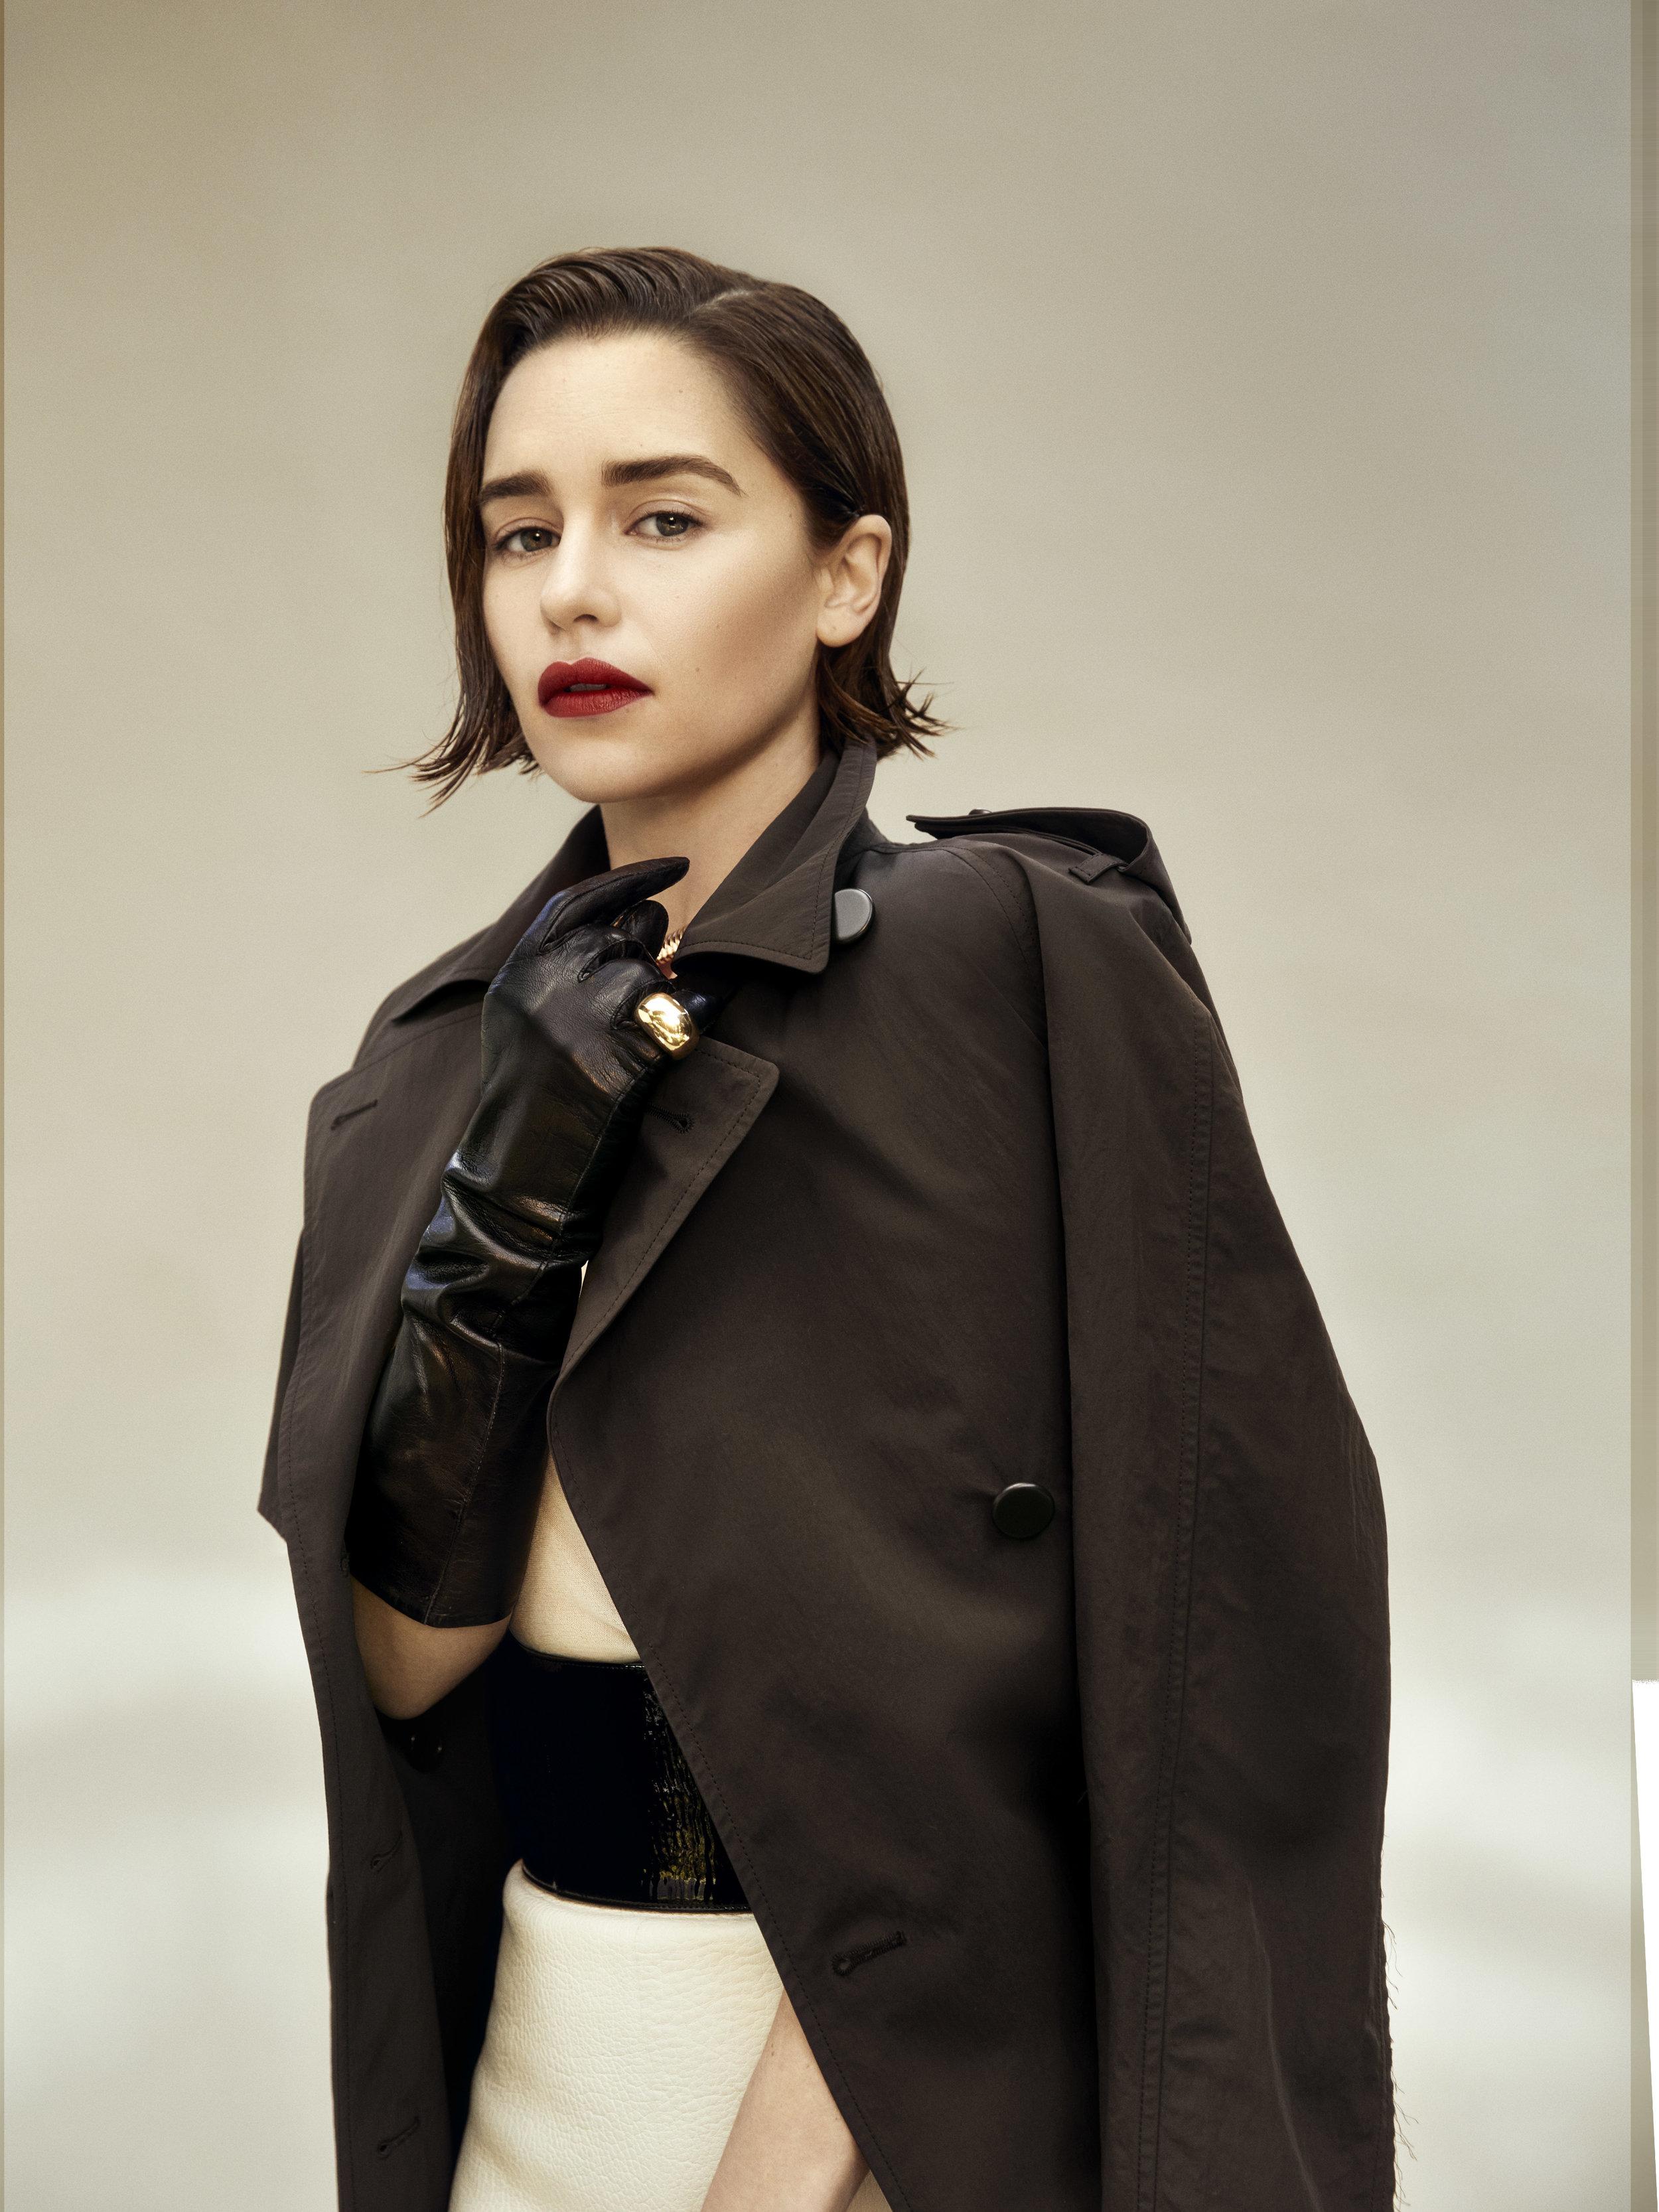 BOTTEGA VENETA   coat, top, and skirt,   LACRASIA     gloves,   BVLGARI     Serpenti necklace, and     CARTIER   Goldmaster De Cartier ring.